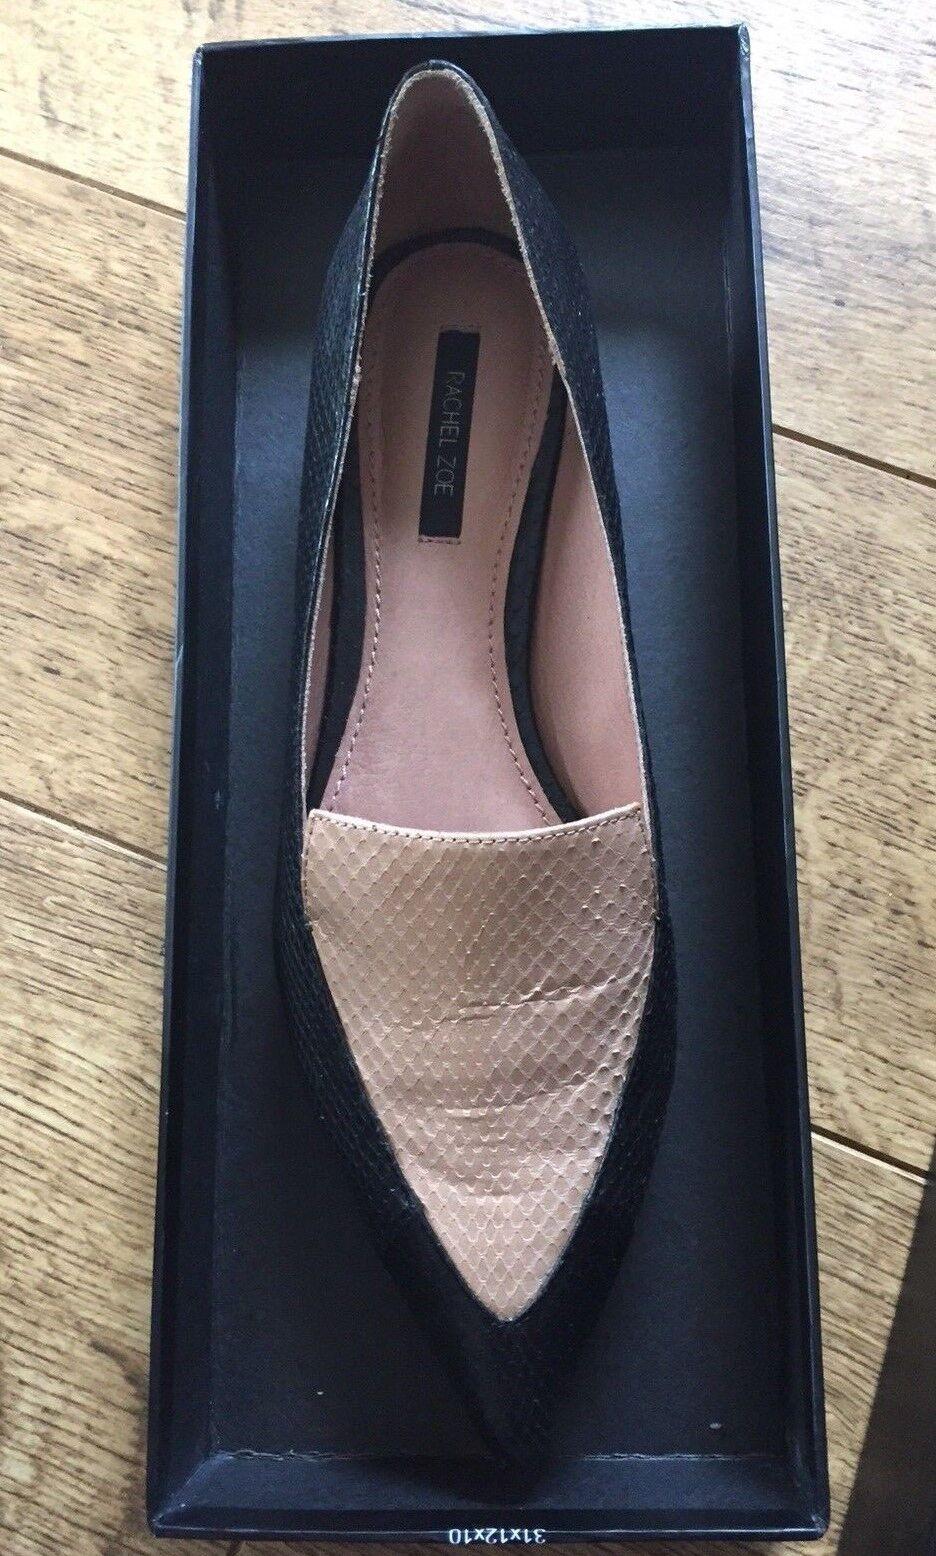 Dansko Professional Clog White Box Leather - size - EU 42 US 12 - size was $120 10eb37